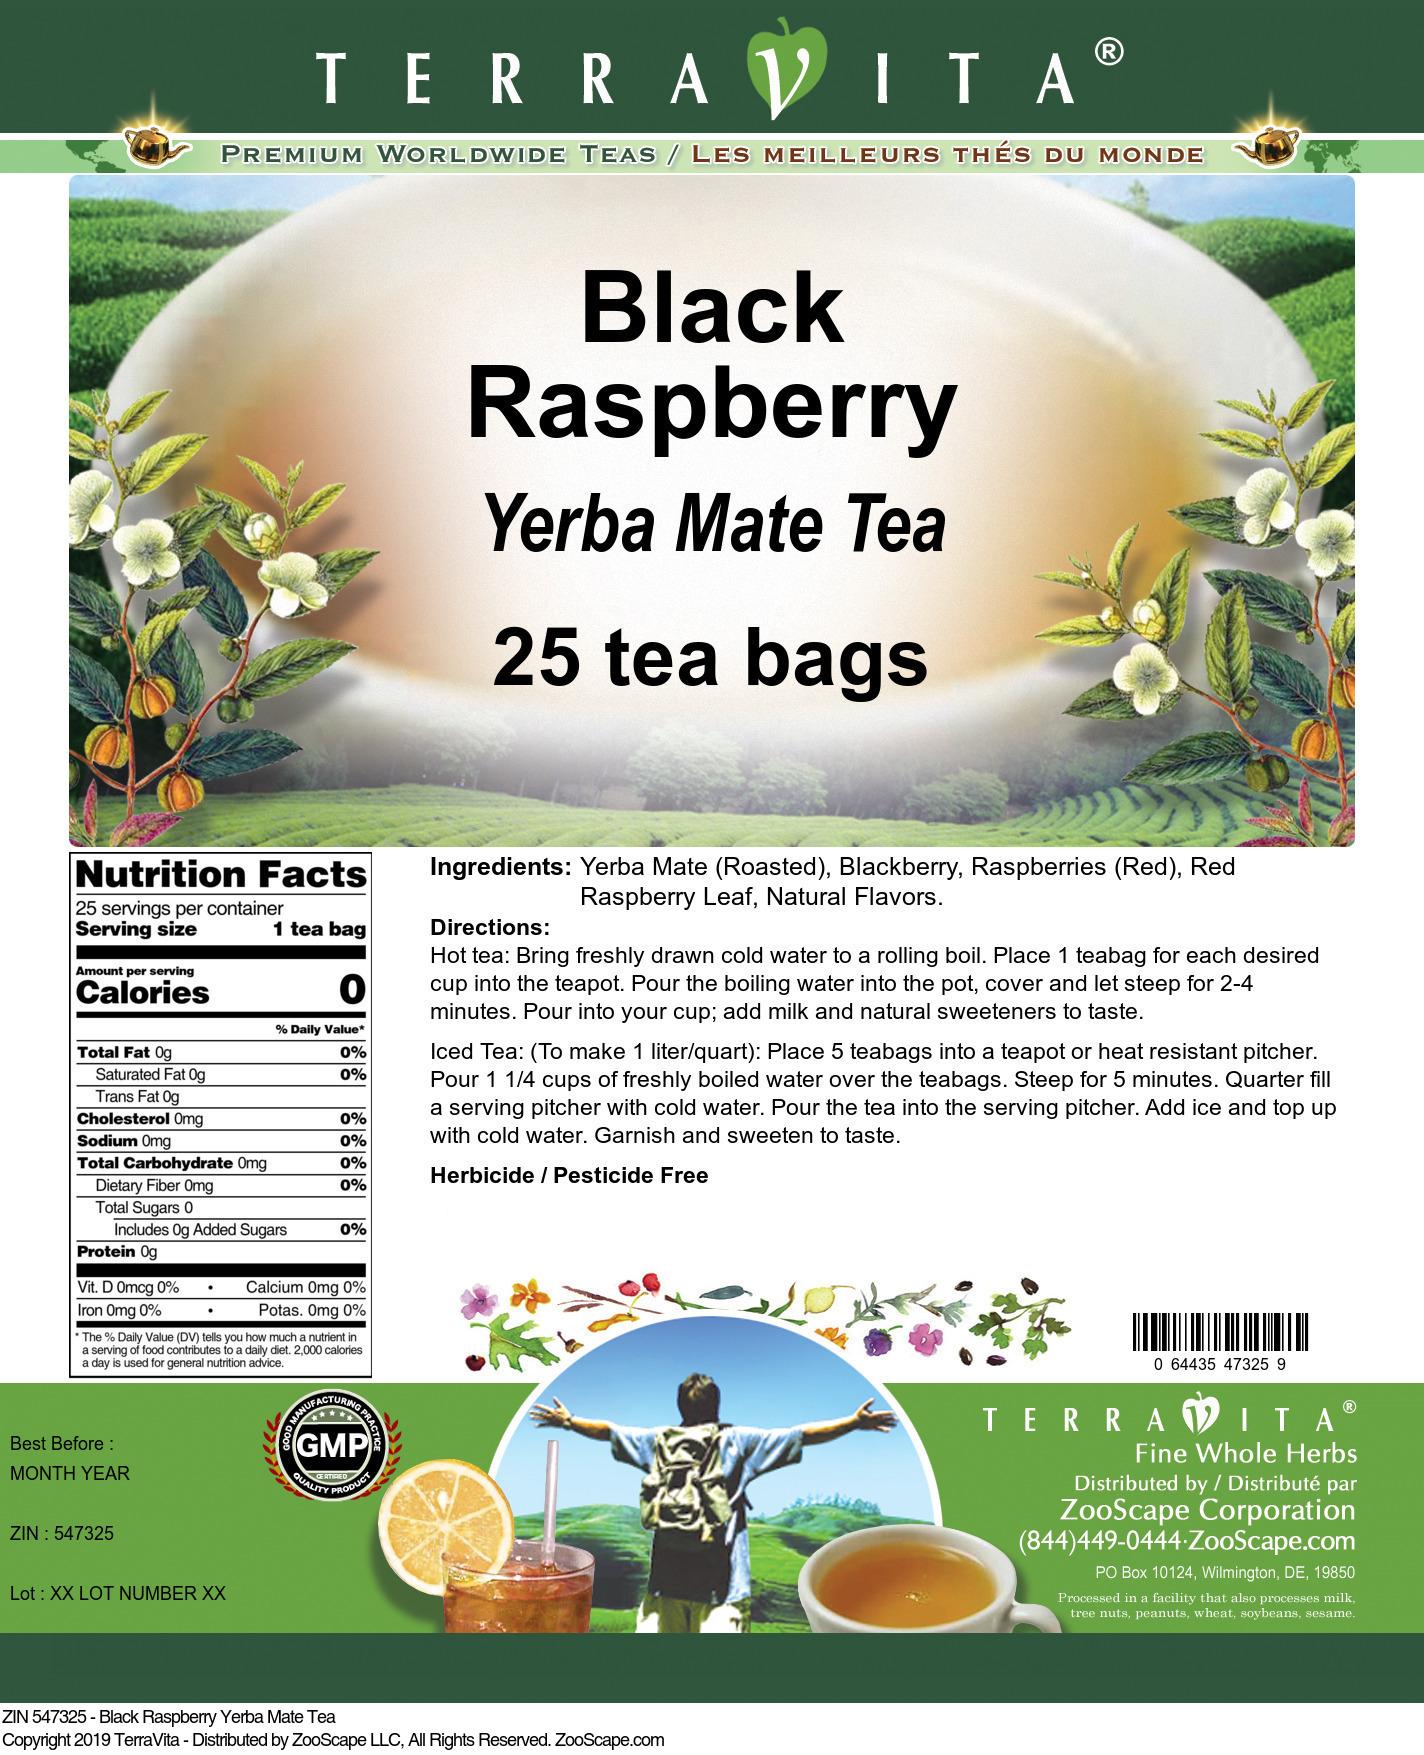 Black Raspberry Yerba Mate Tea